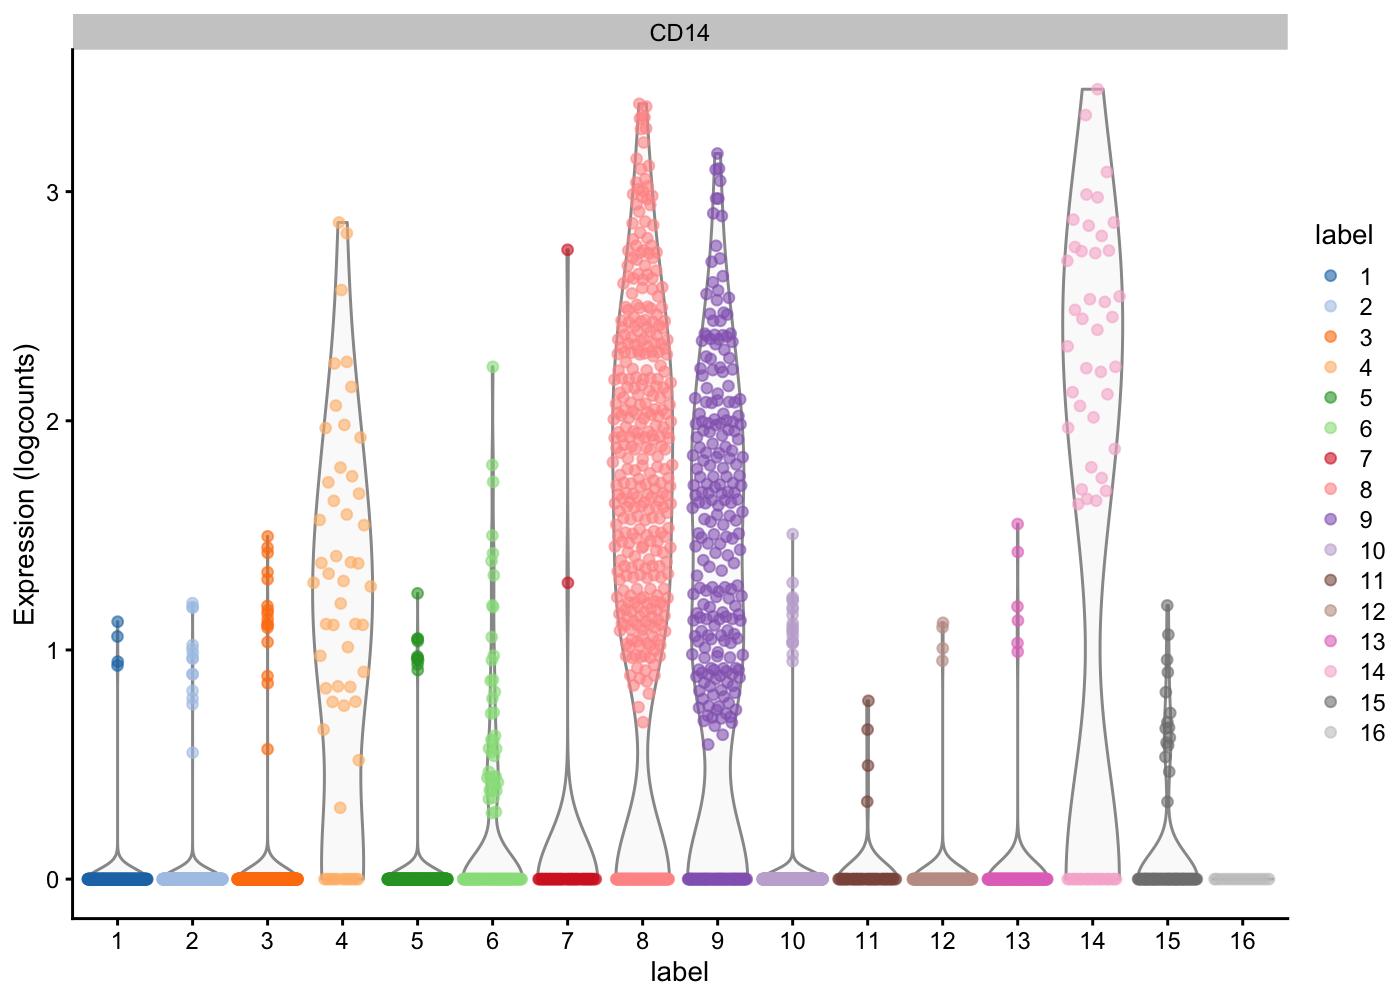 public/figure/sahmri_analysis-workflow.Rmd/unnamed-chunk-10-1.png